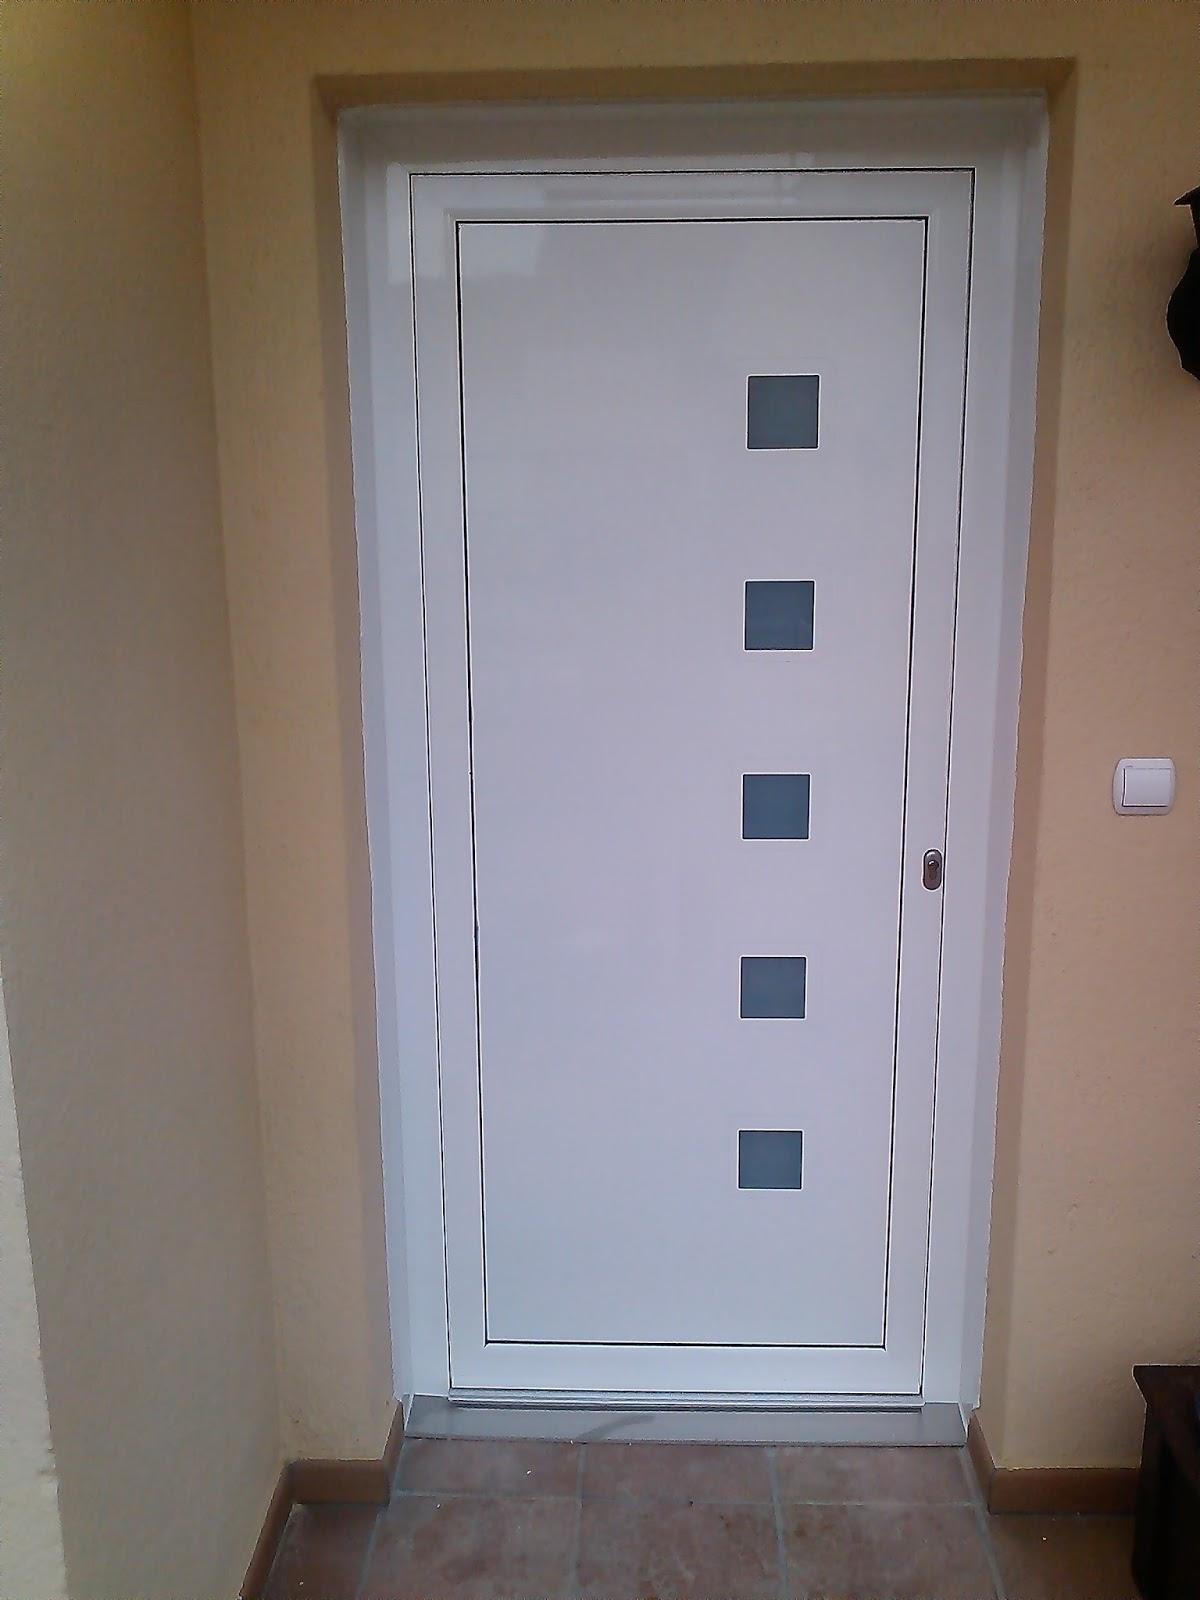 Aluminios arpo puerta de entrada en aluminio for Puertas de entrada de aluminio rusticas